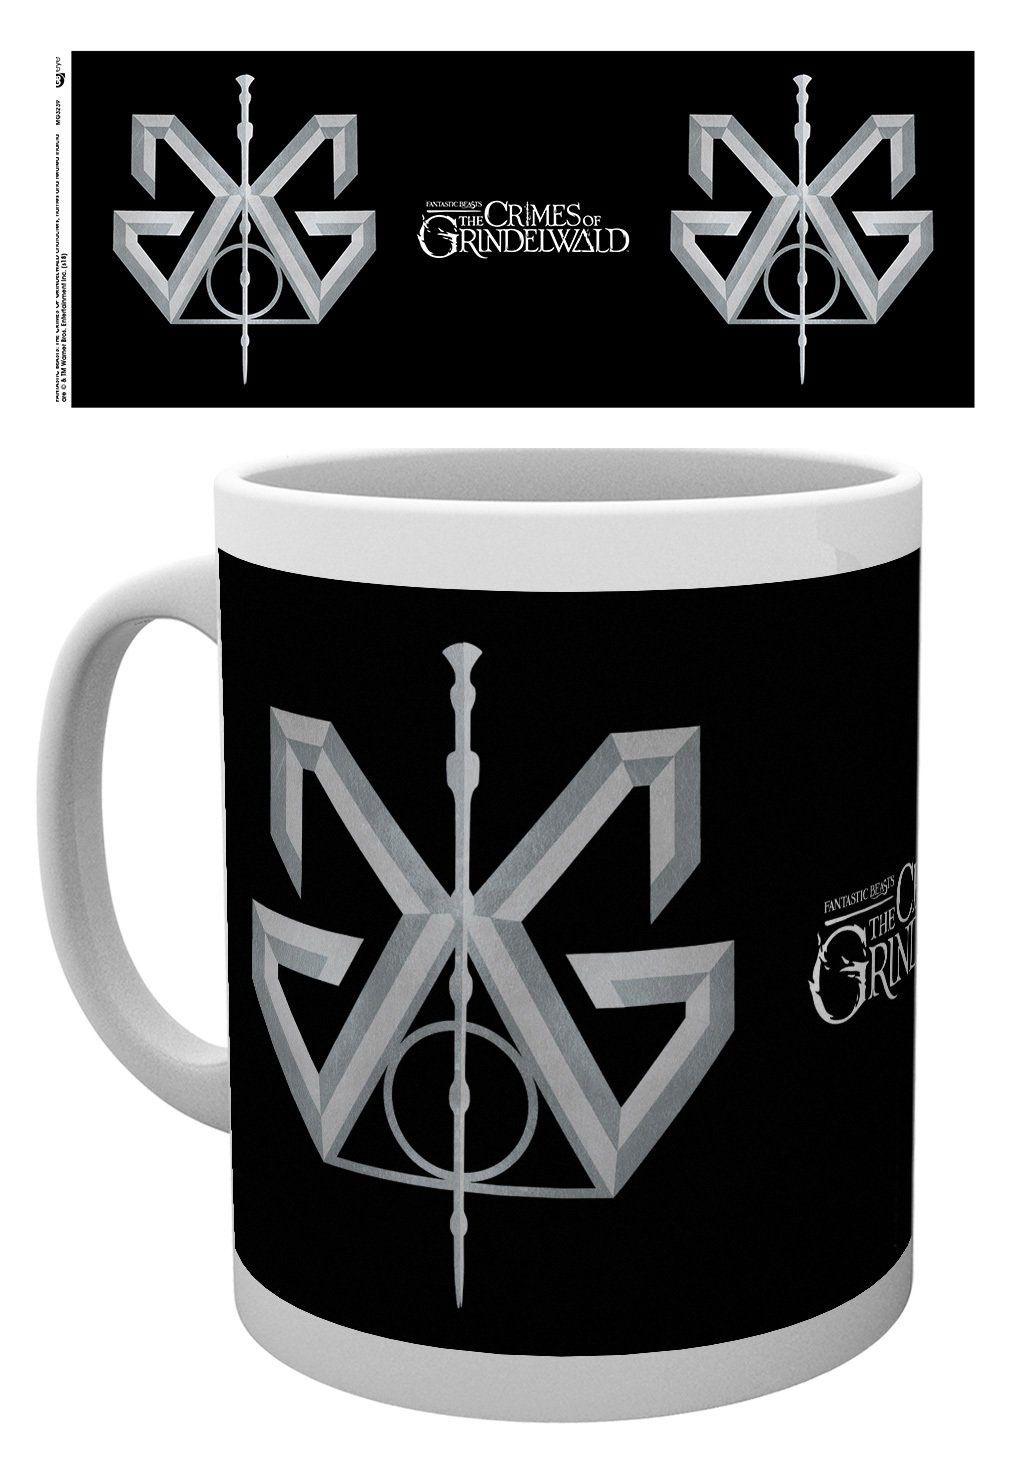 Fantastic Beasts 2 Mug Grindlewald Emblem